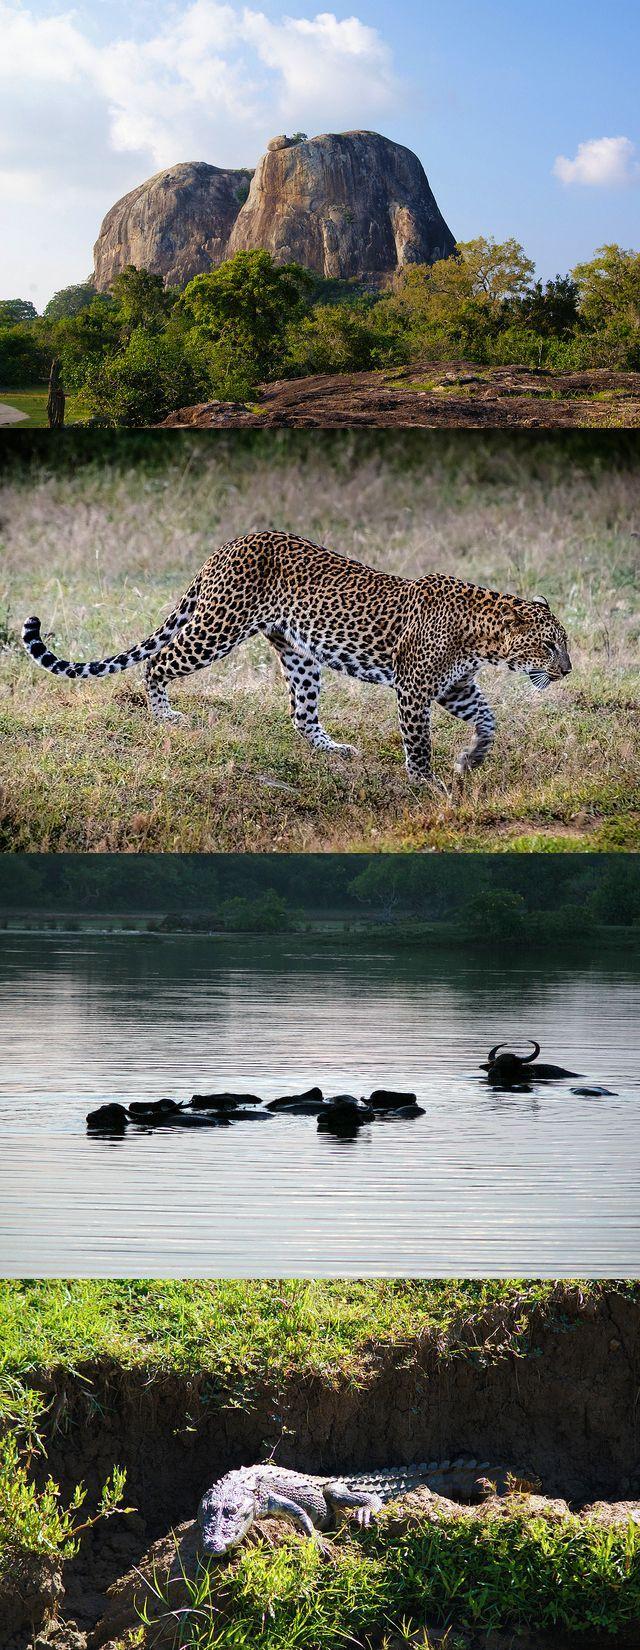 Plan Your Trip To Sri Lanka With Exploring Tourism Yala National Park, Sri Lanka